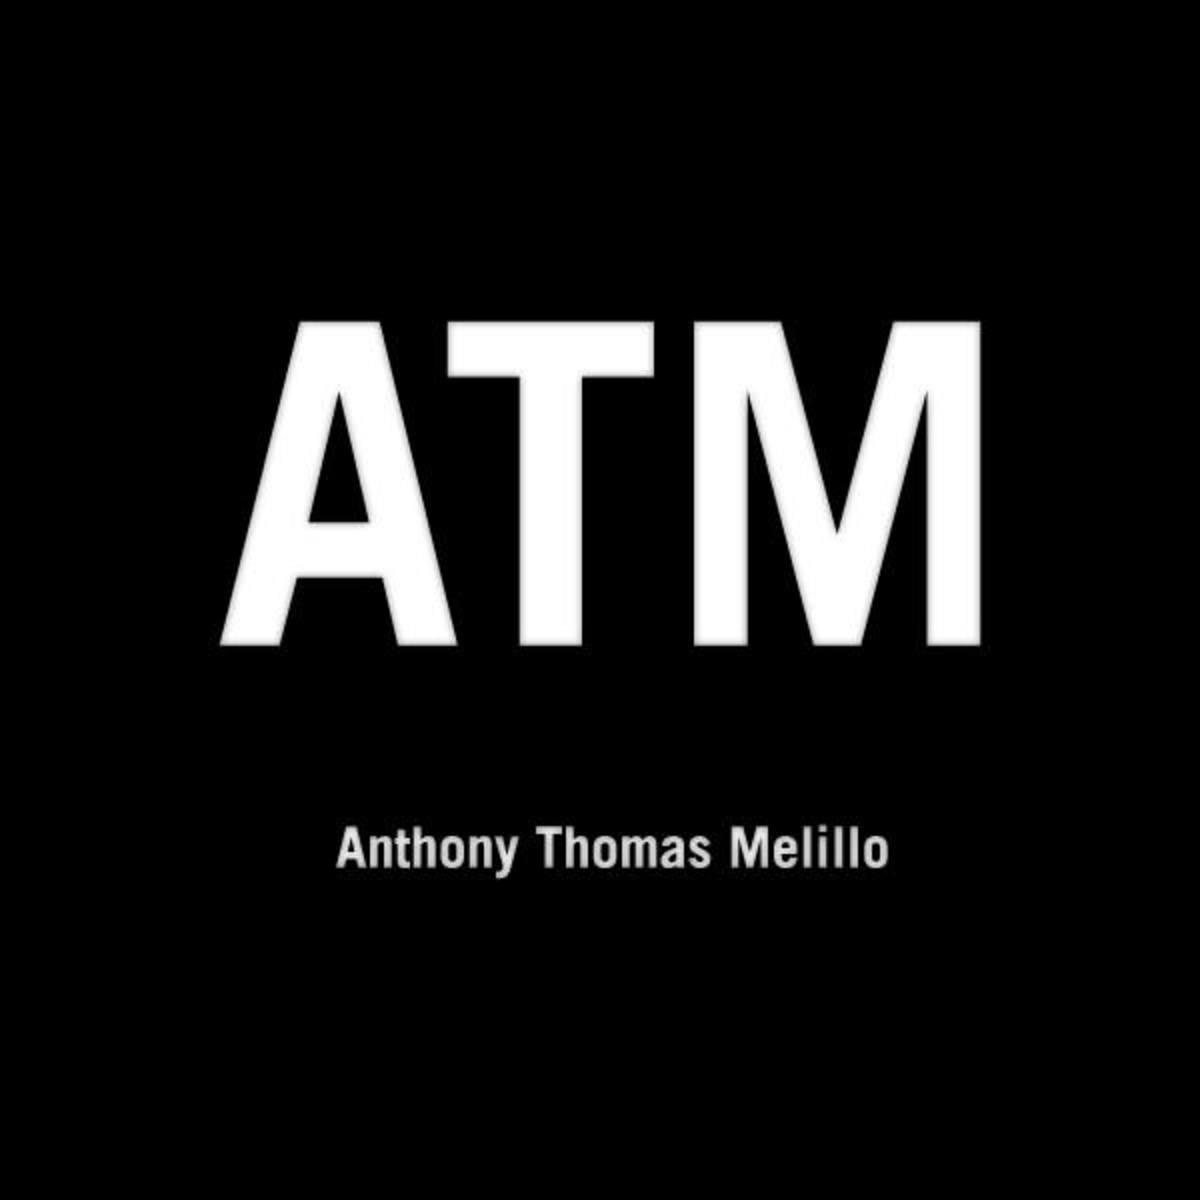 ATM ANTHONY THOMAS MELILLO SEEKS SALES MERCHANDISING